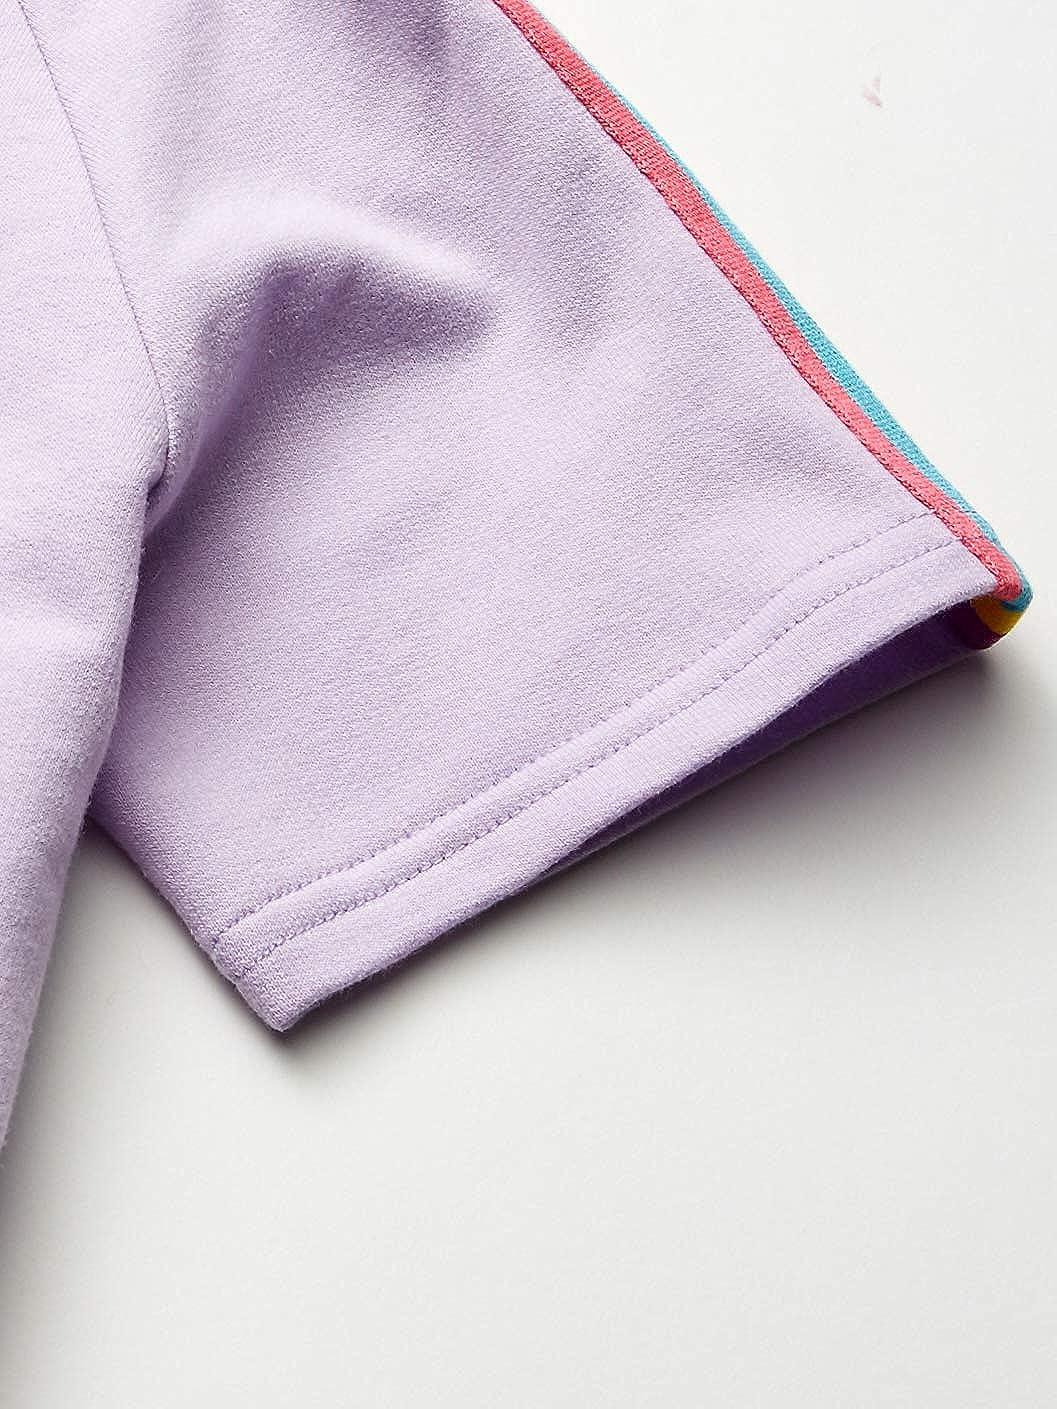 Jojo Siwa Girls Glitter Everywhere Pull Over Skimmer Hoodie Tee with Taping Hooded Sweatshirt